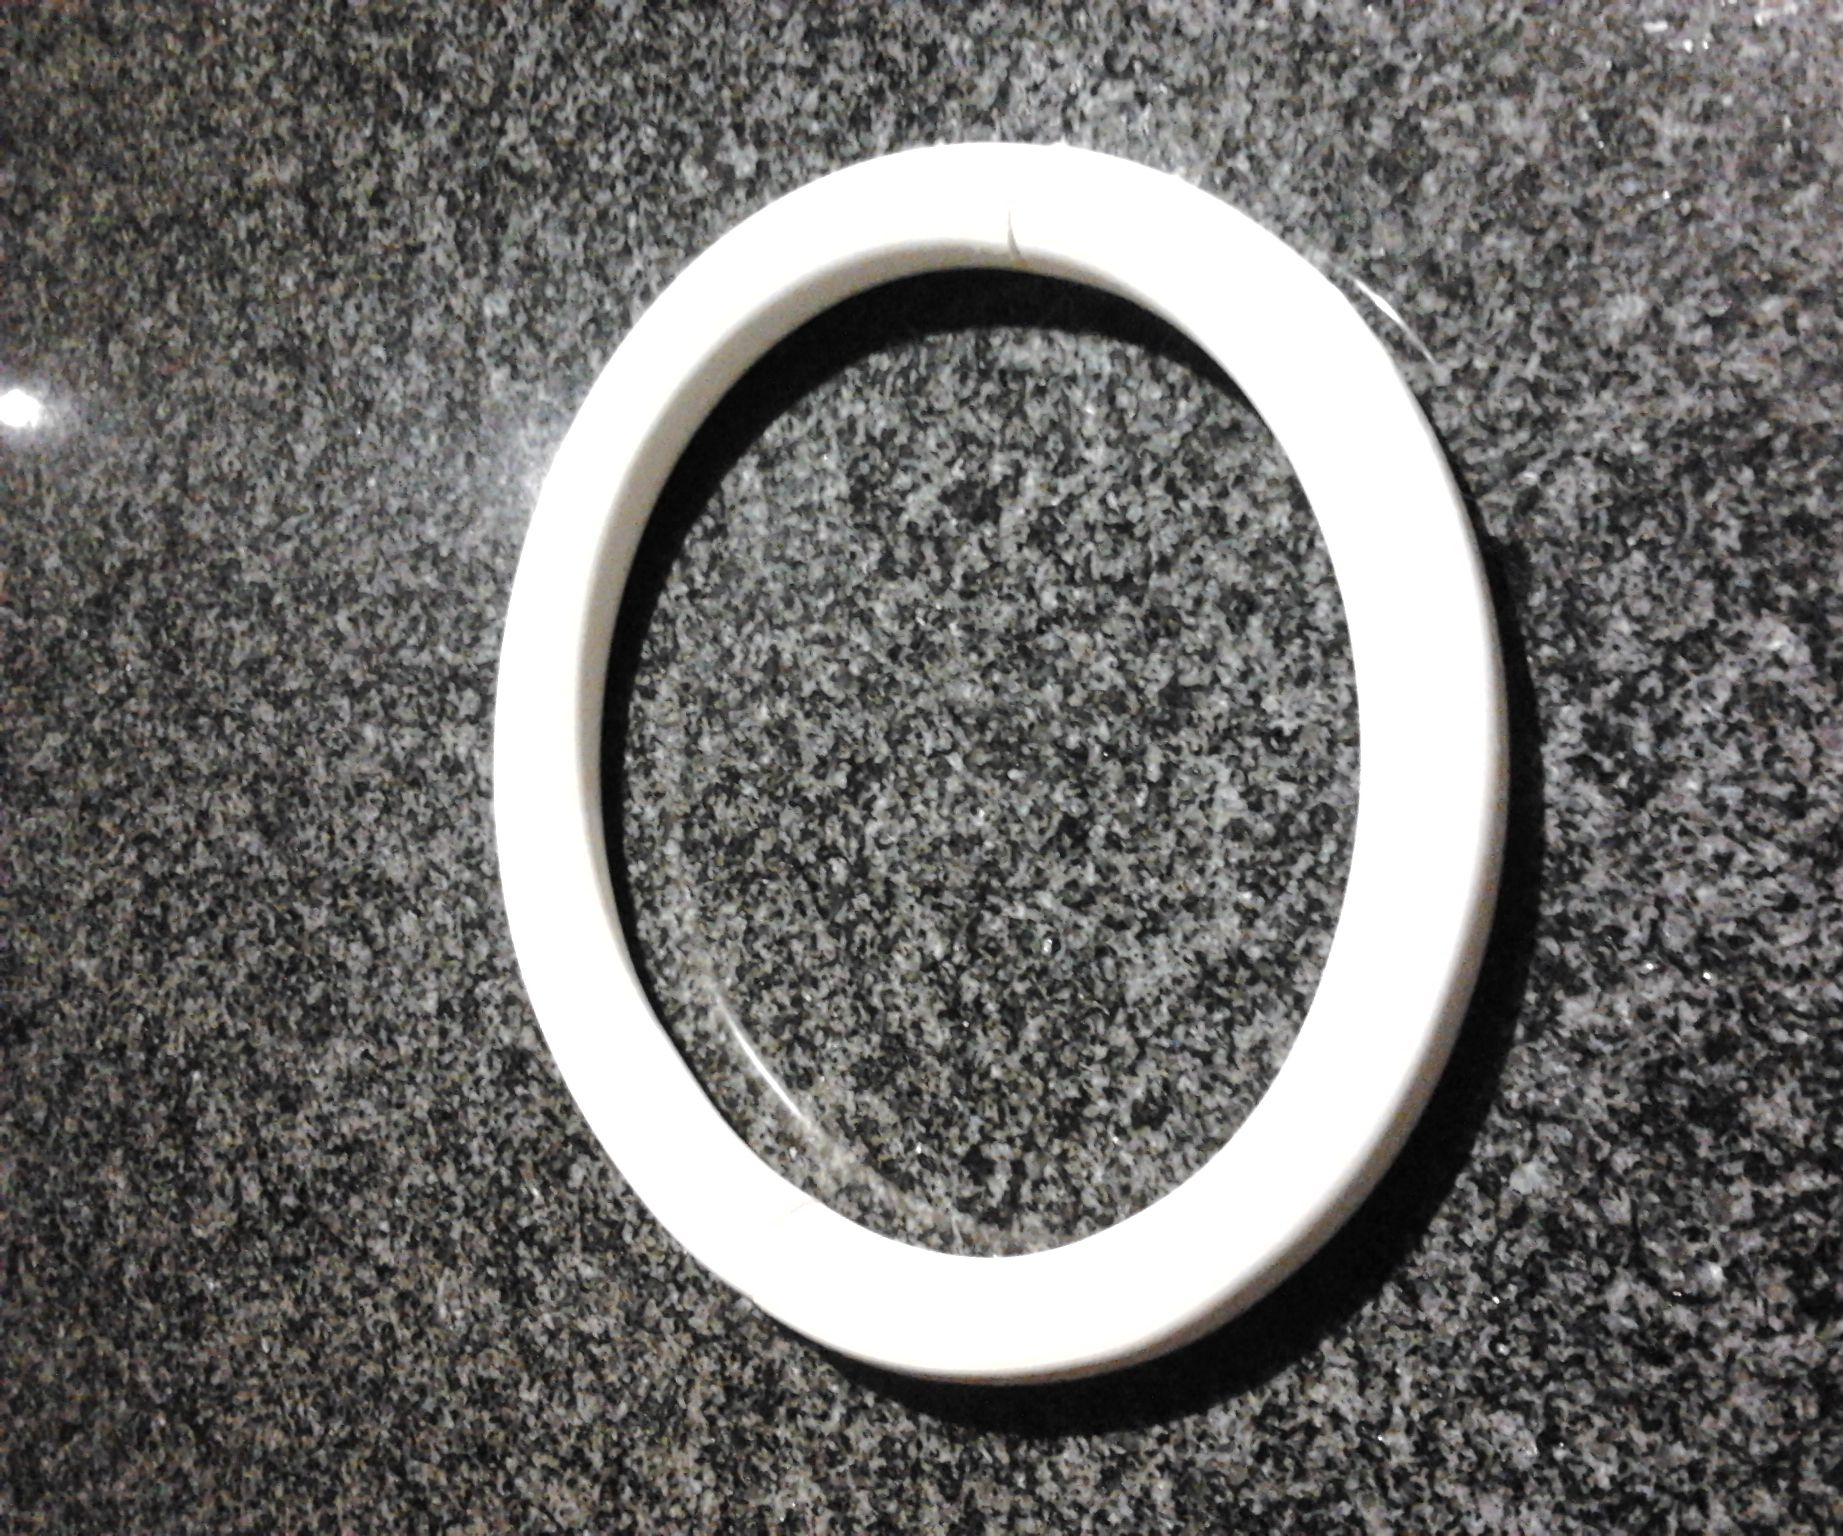 Make a torus out of PVC tubing